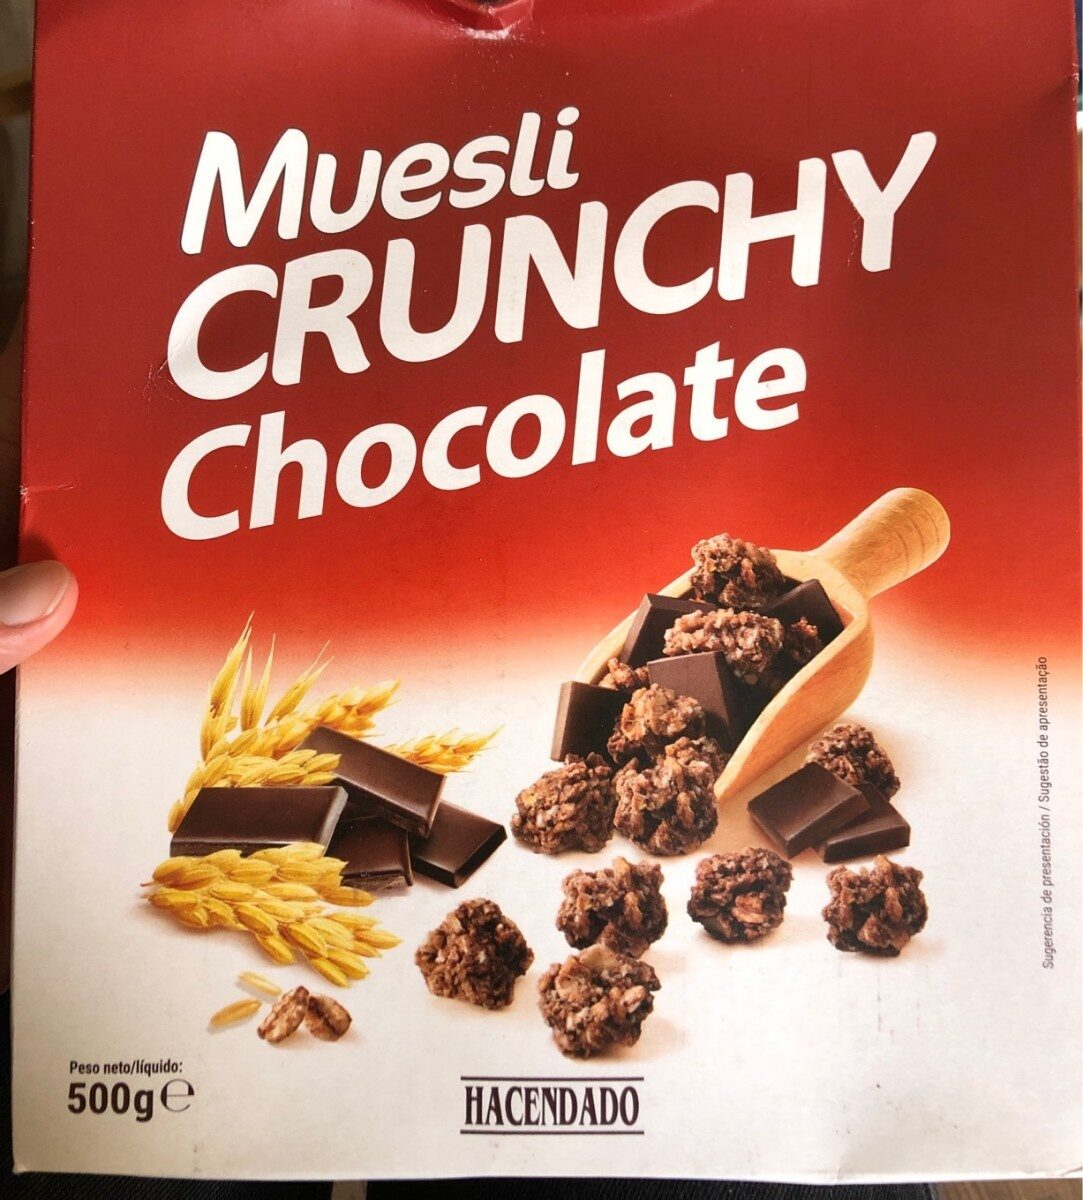 Muesli crunchy chocolate - Producto